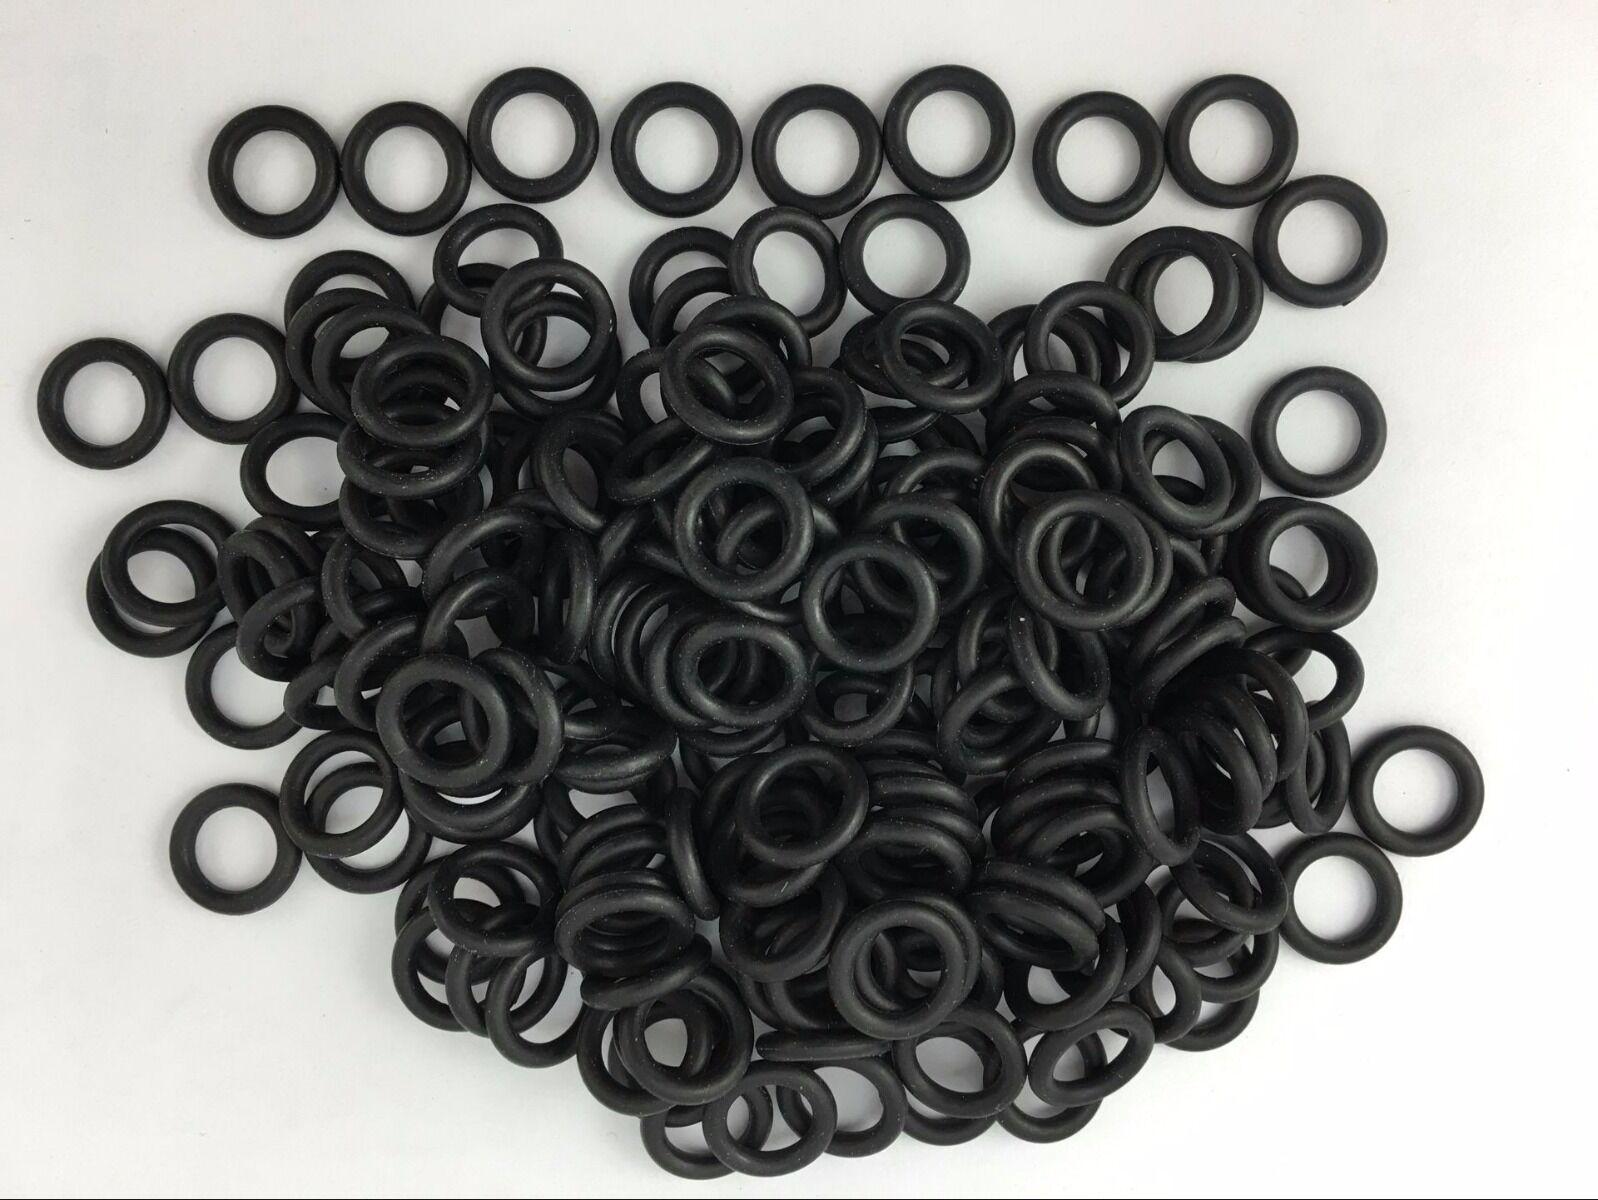 200pcs Screws O-Rings bands GI Joe Cobra Action Force orings 200pcs O-Rings